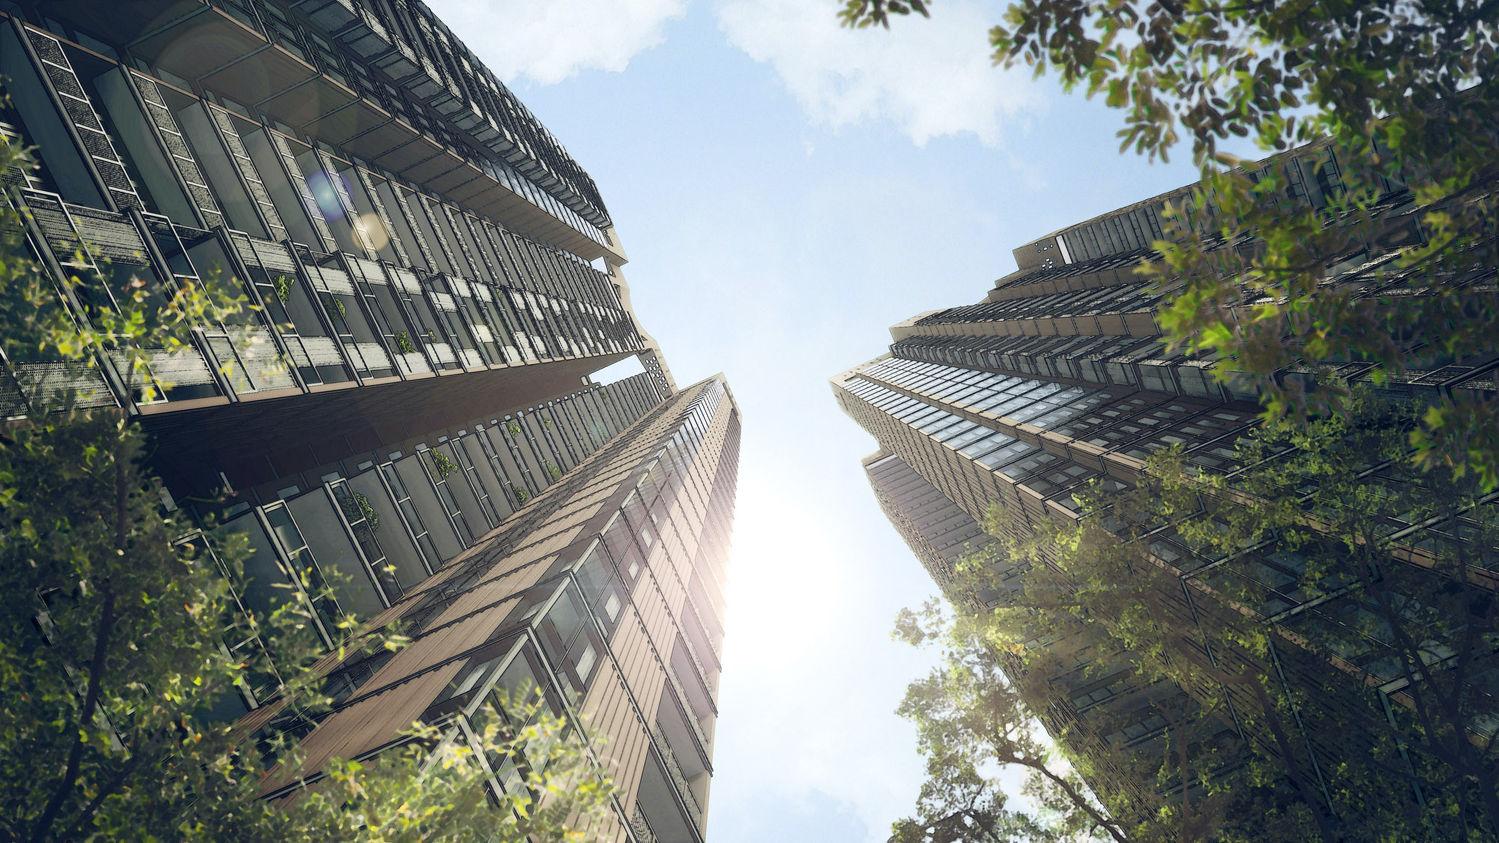 EDGEPROP SINGAPORE -  拥有450套单位的玛庭豪苑(Martin Modern)已经达成超过400套单位的销售,计划在2021年上半年完成销售